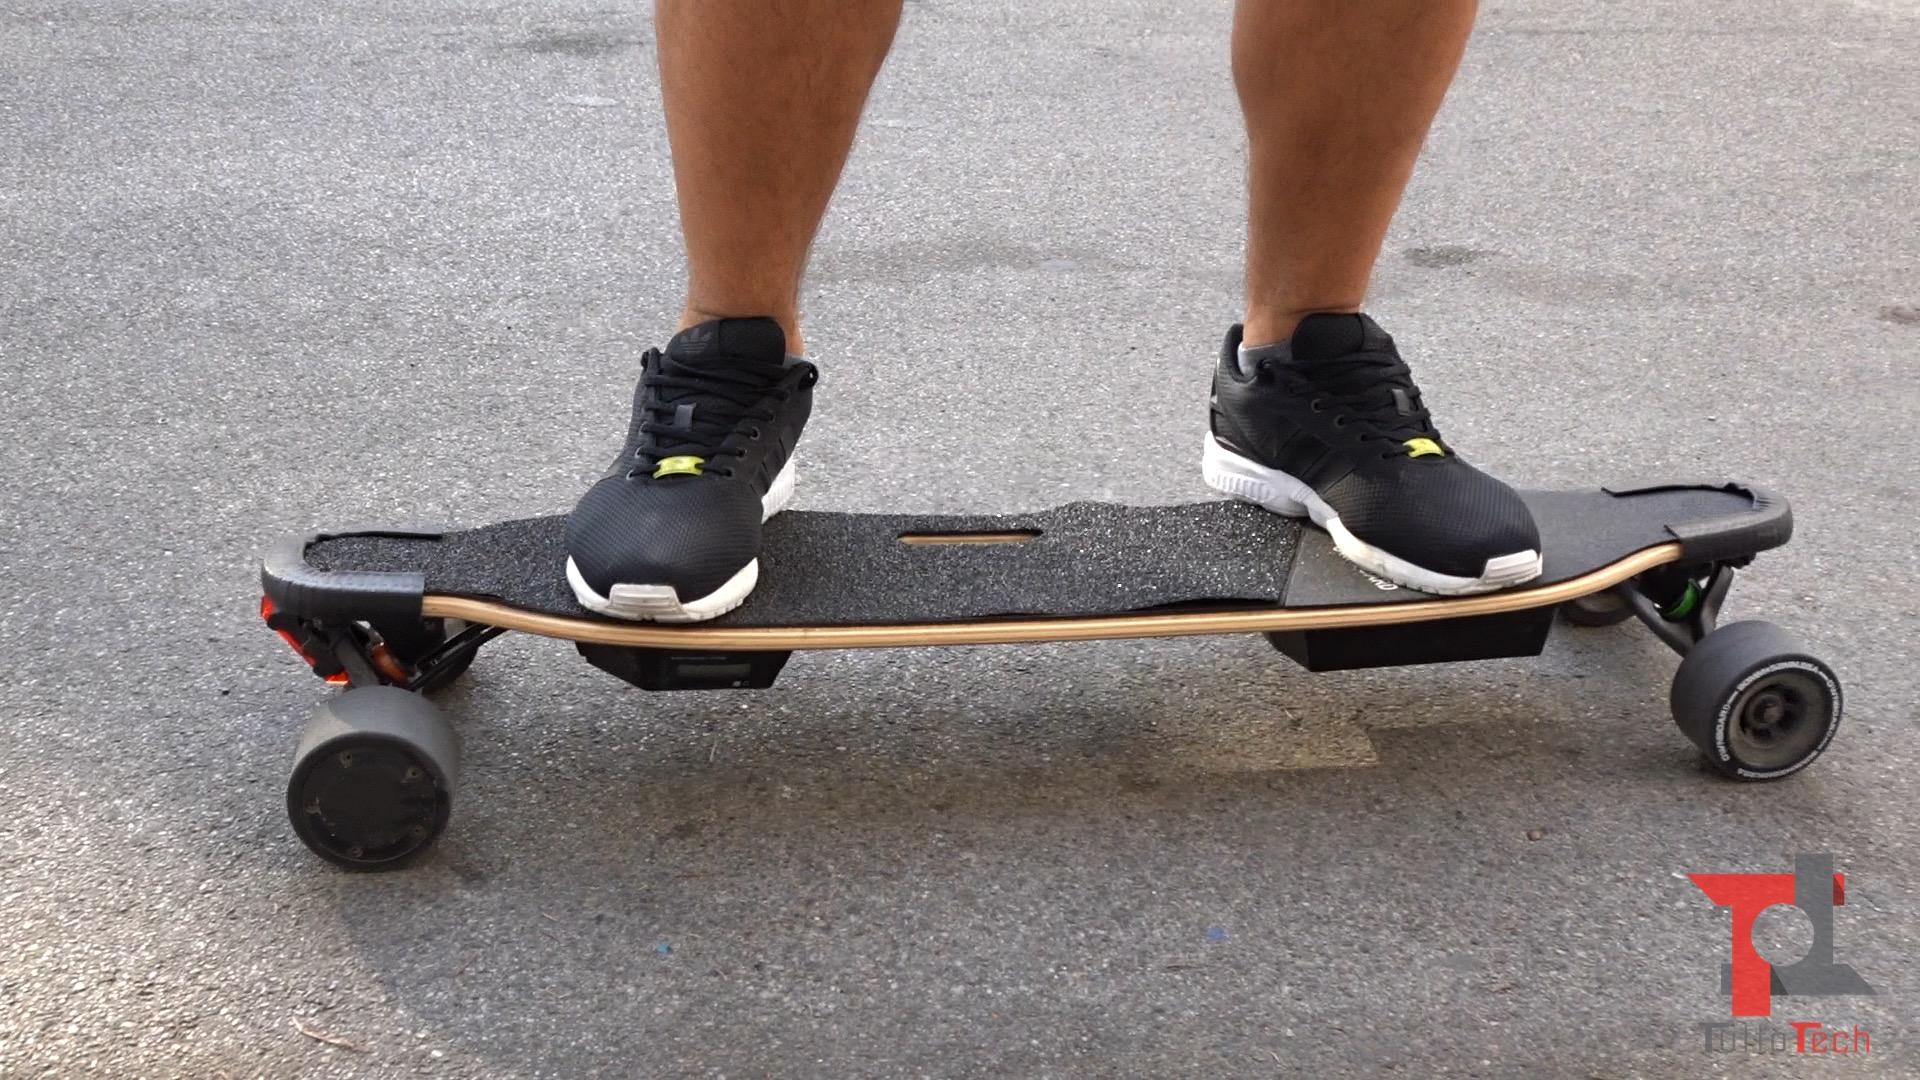 Recensione Ownboard W1S: il best buy degli skateboard elettrici 2